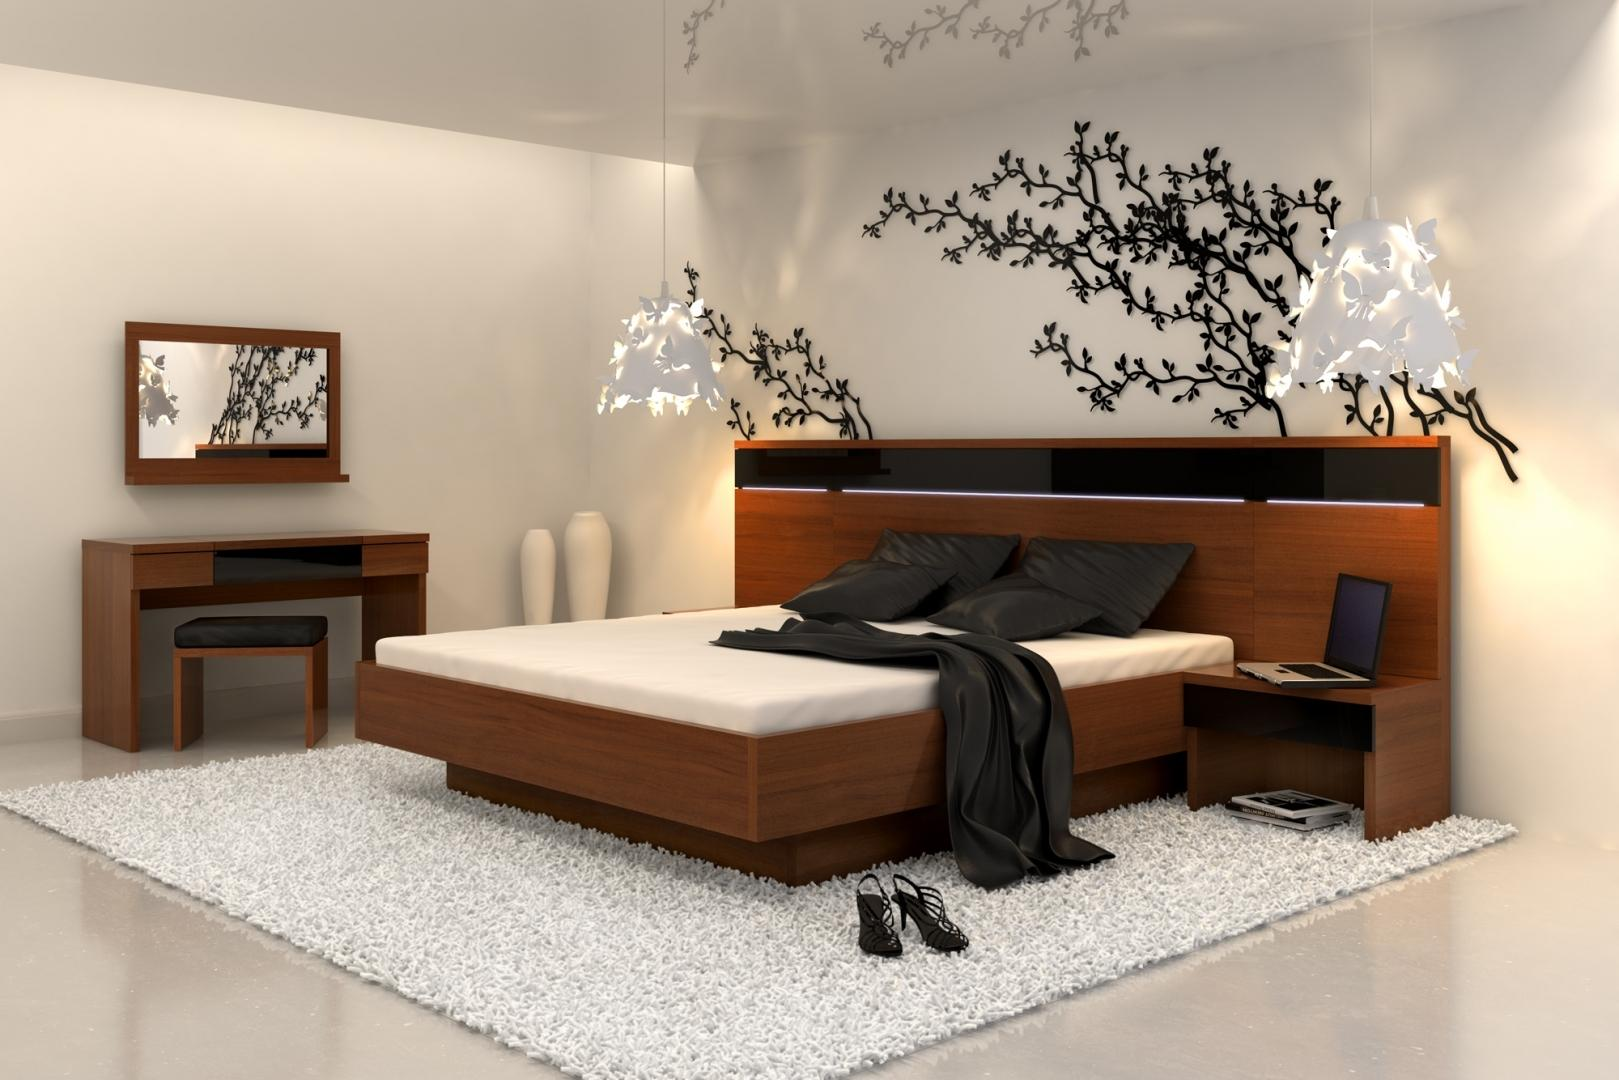 интерьер спальной комнаты по фен-шуй идеи дизайна